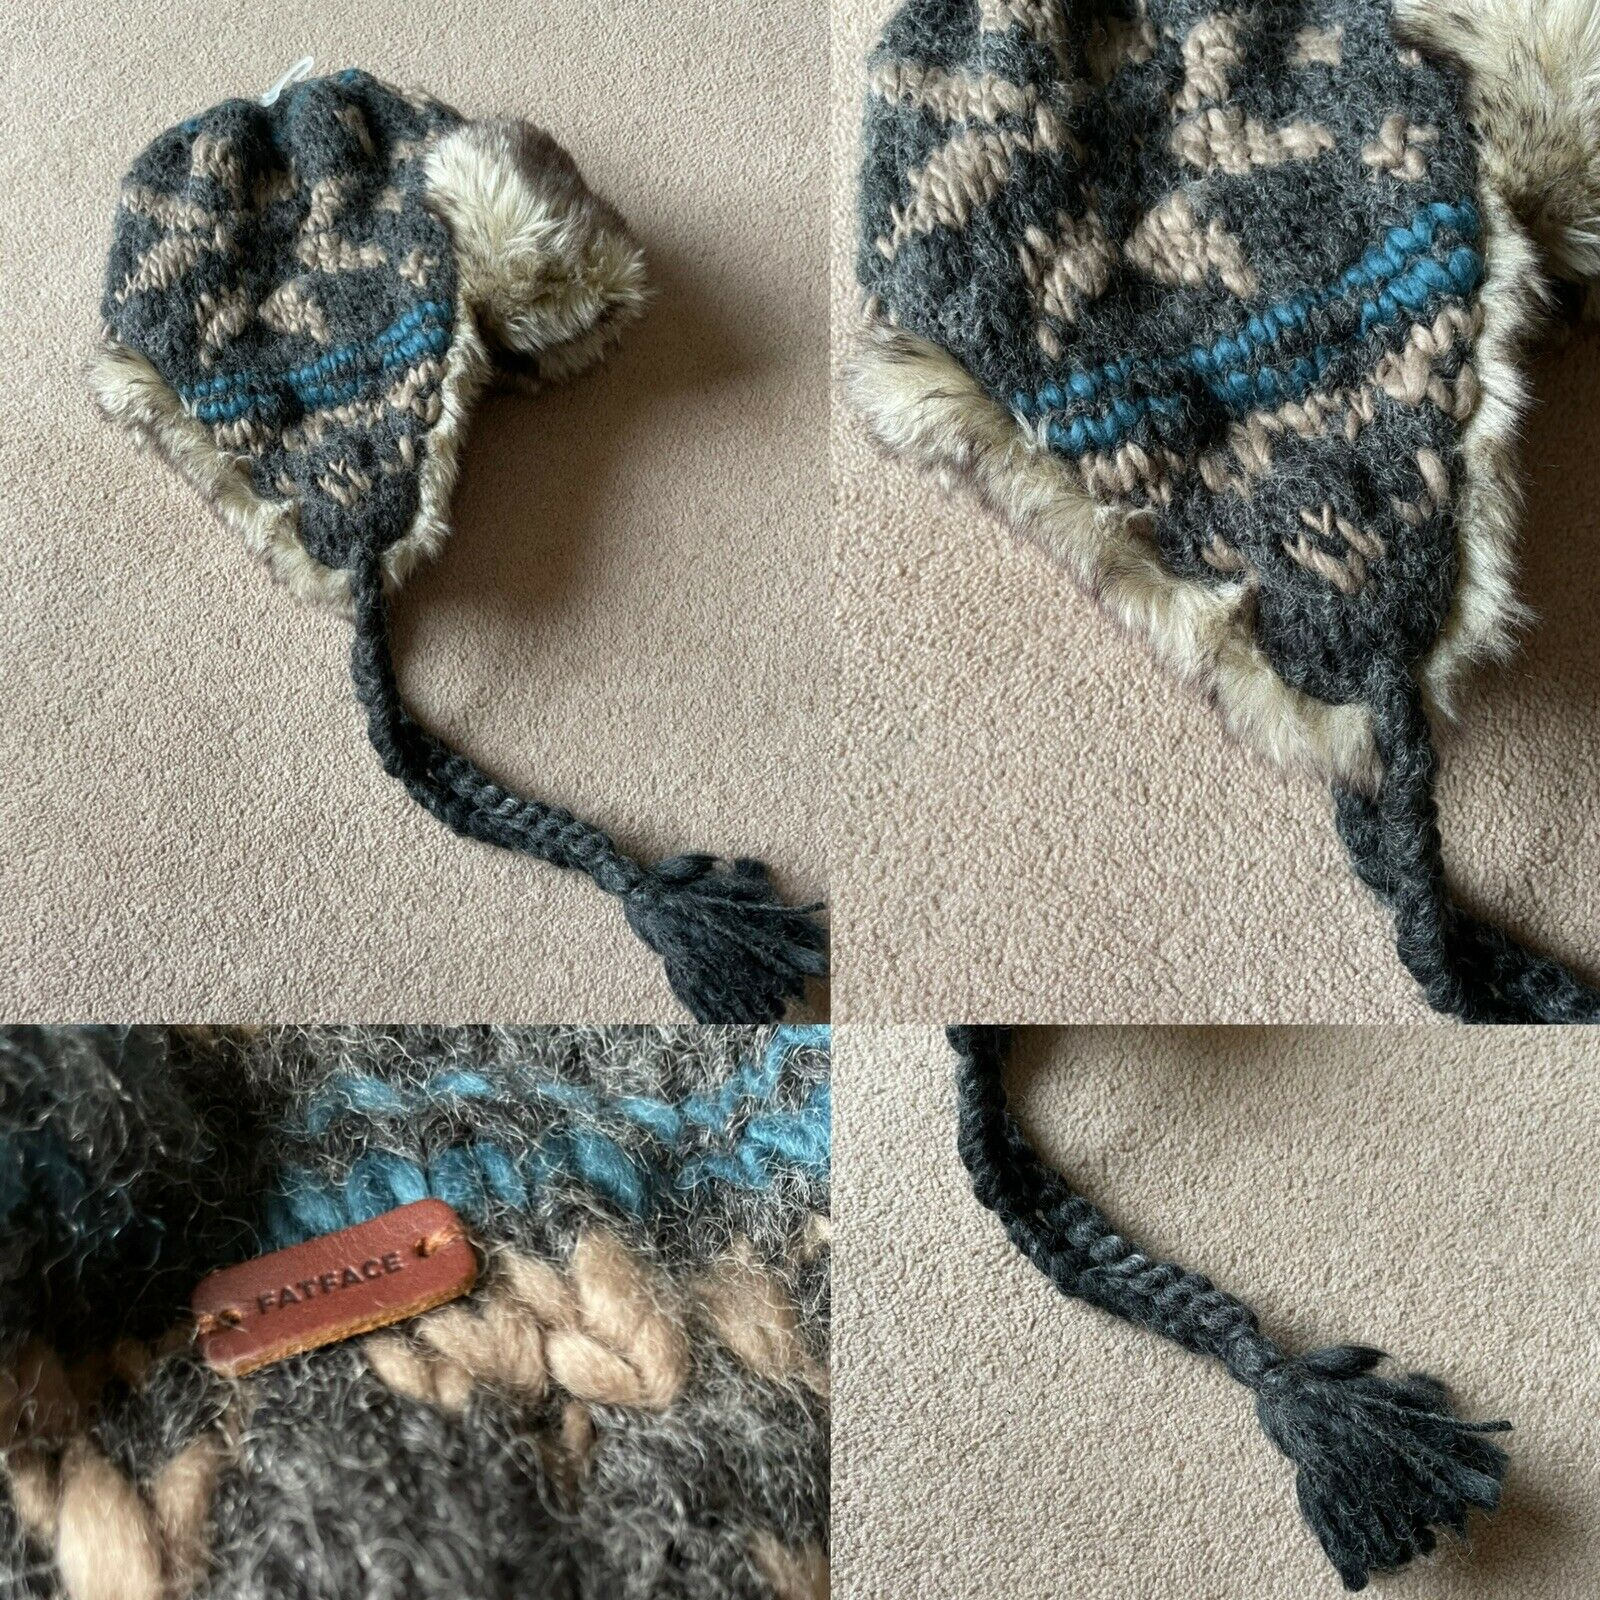 BNWOT FAT FACE Grey Beige NORDIC KNIT Faux Fur Trim TRAPPER Hat